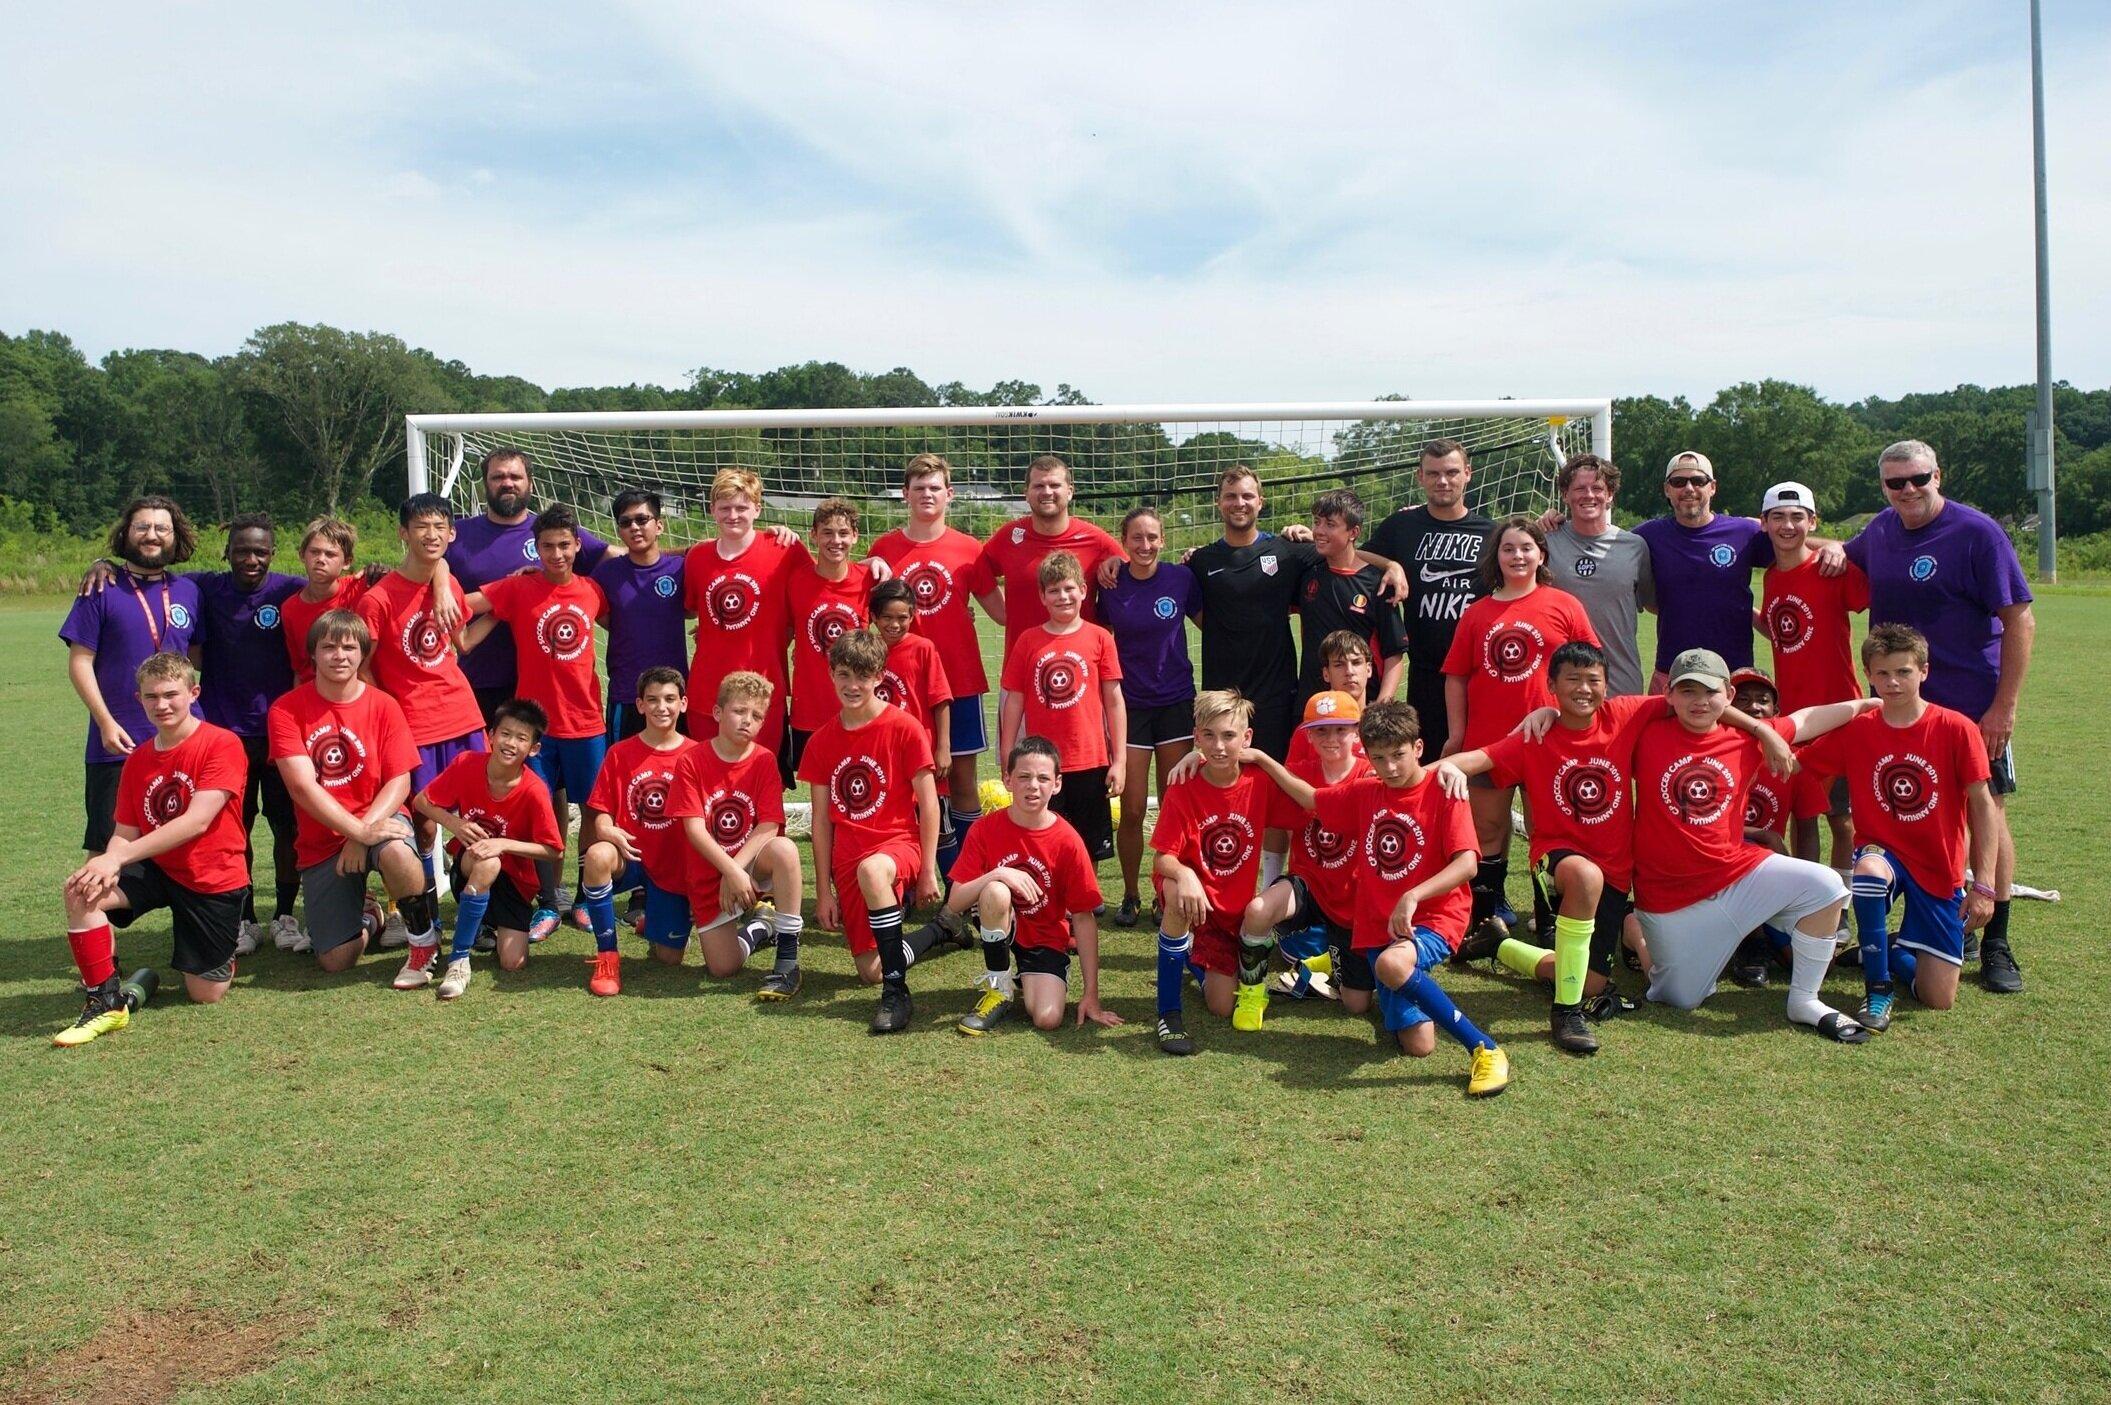 CP Soccer Camp 2019, Clemson University, SC